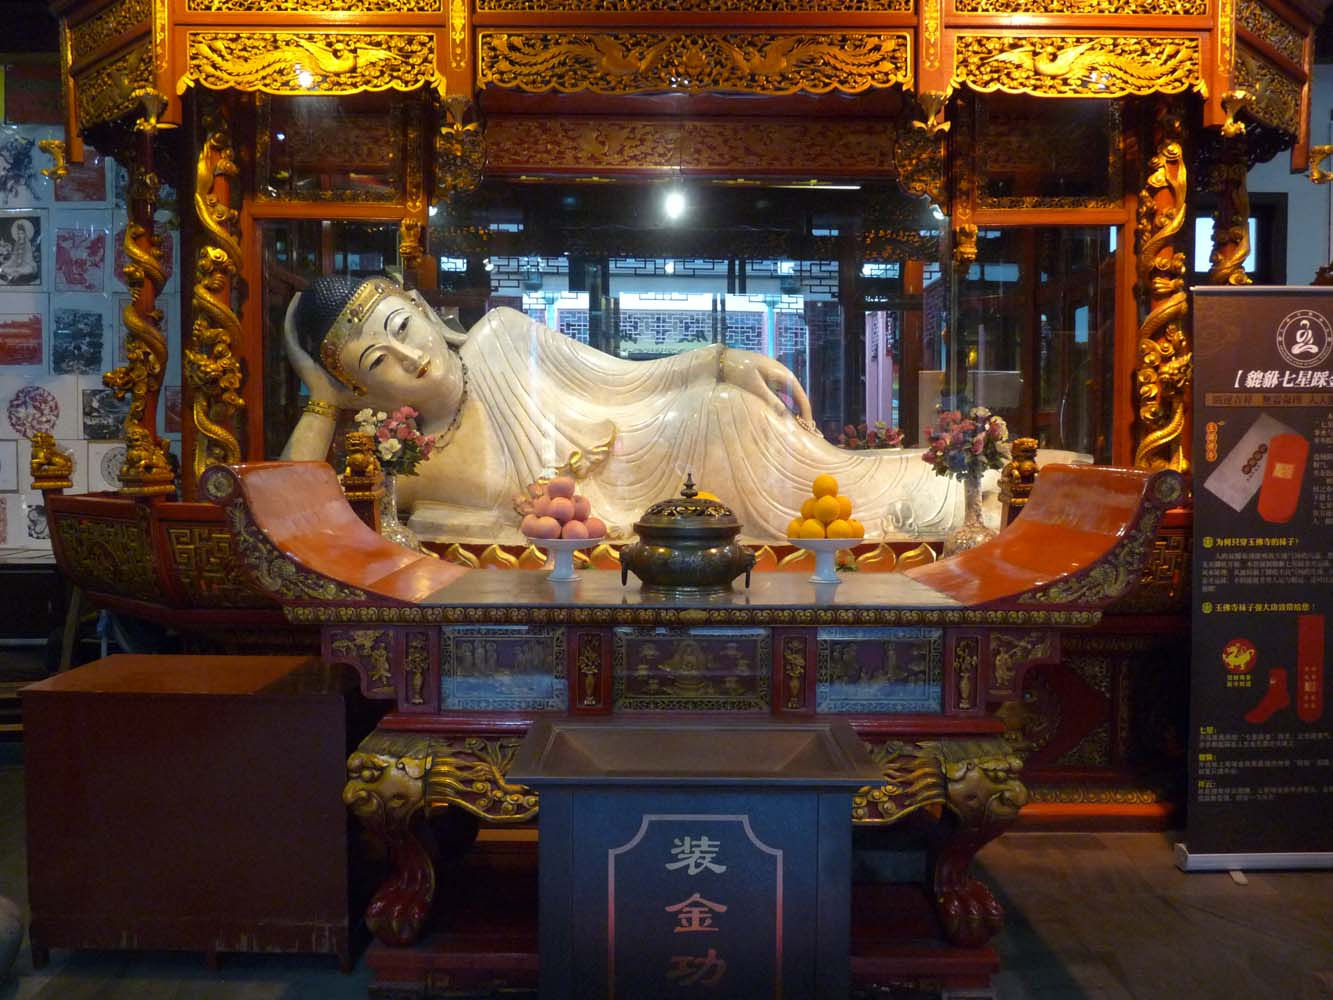 LCNS Jade Buddha Temple Shanghai 2